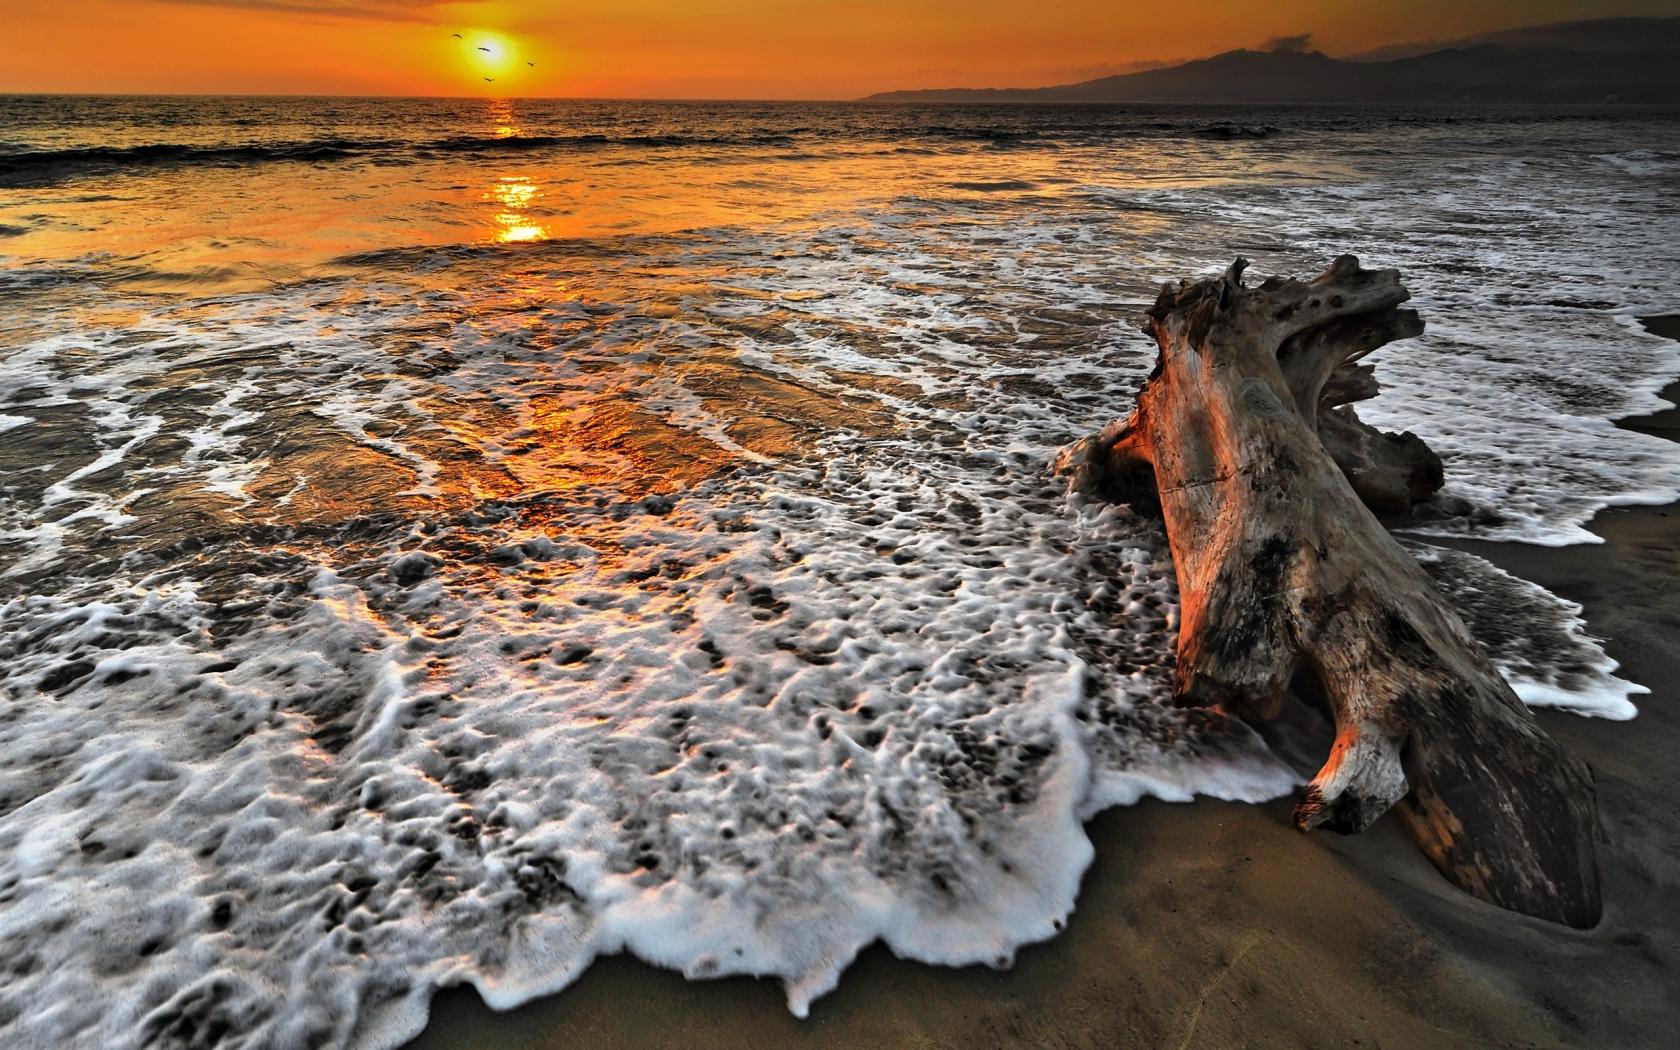 Atardecer en playas - 1680x1050